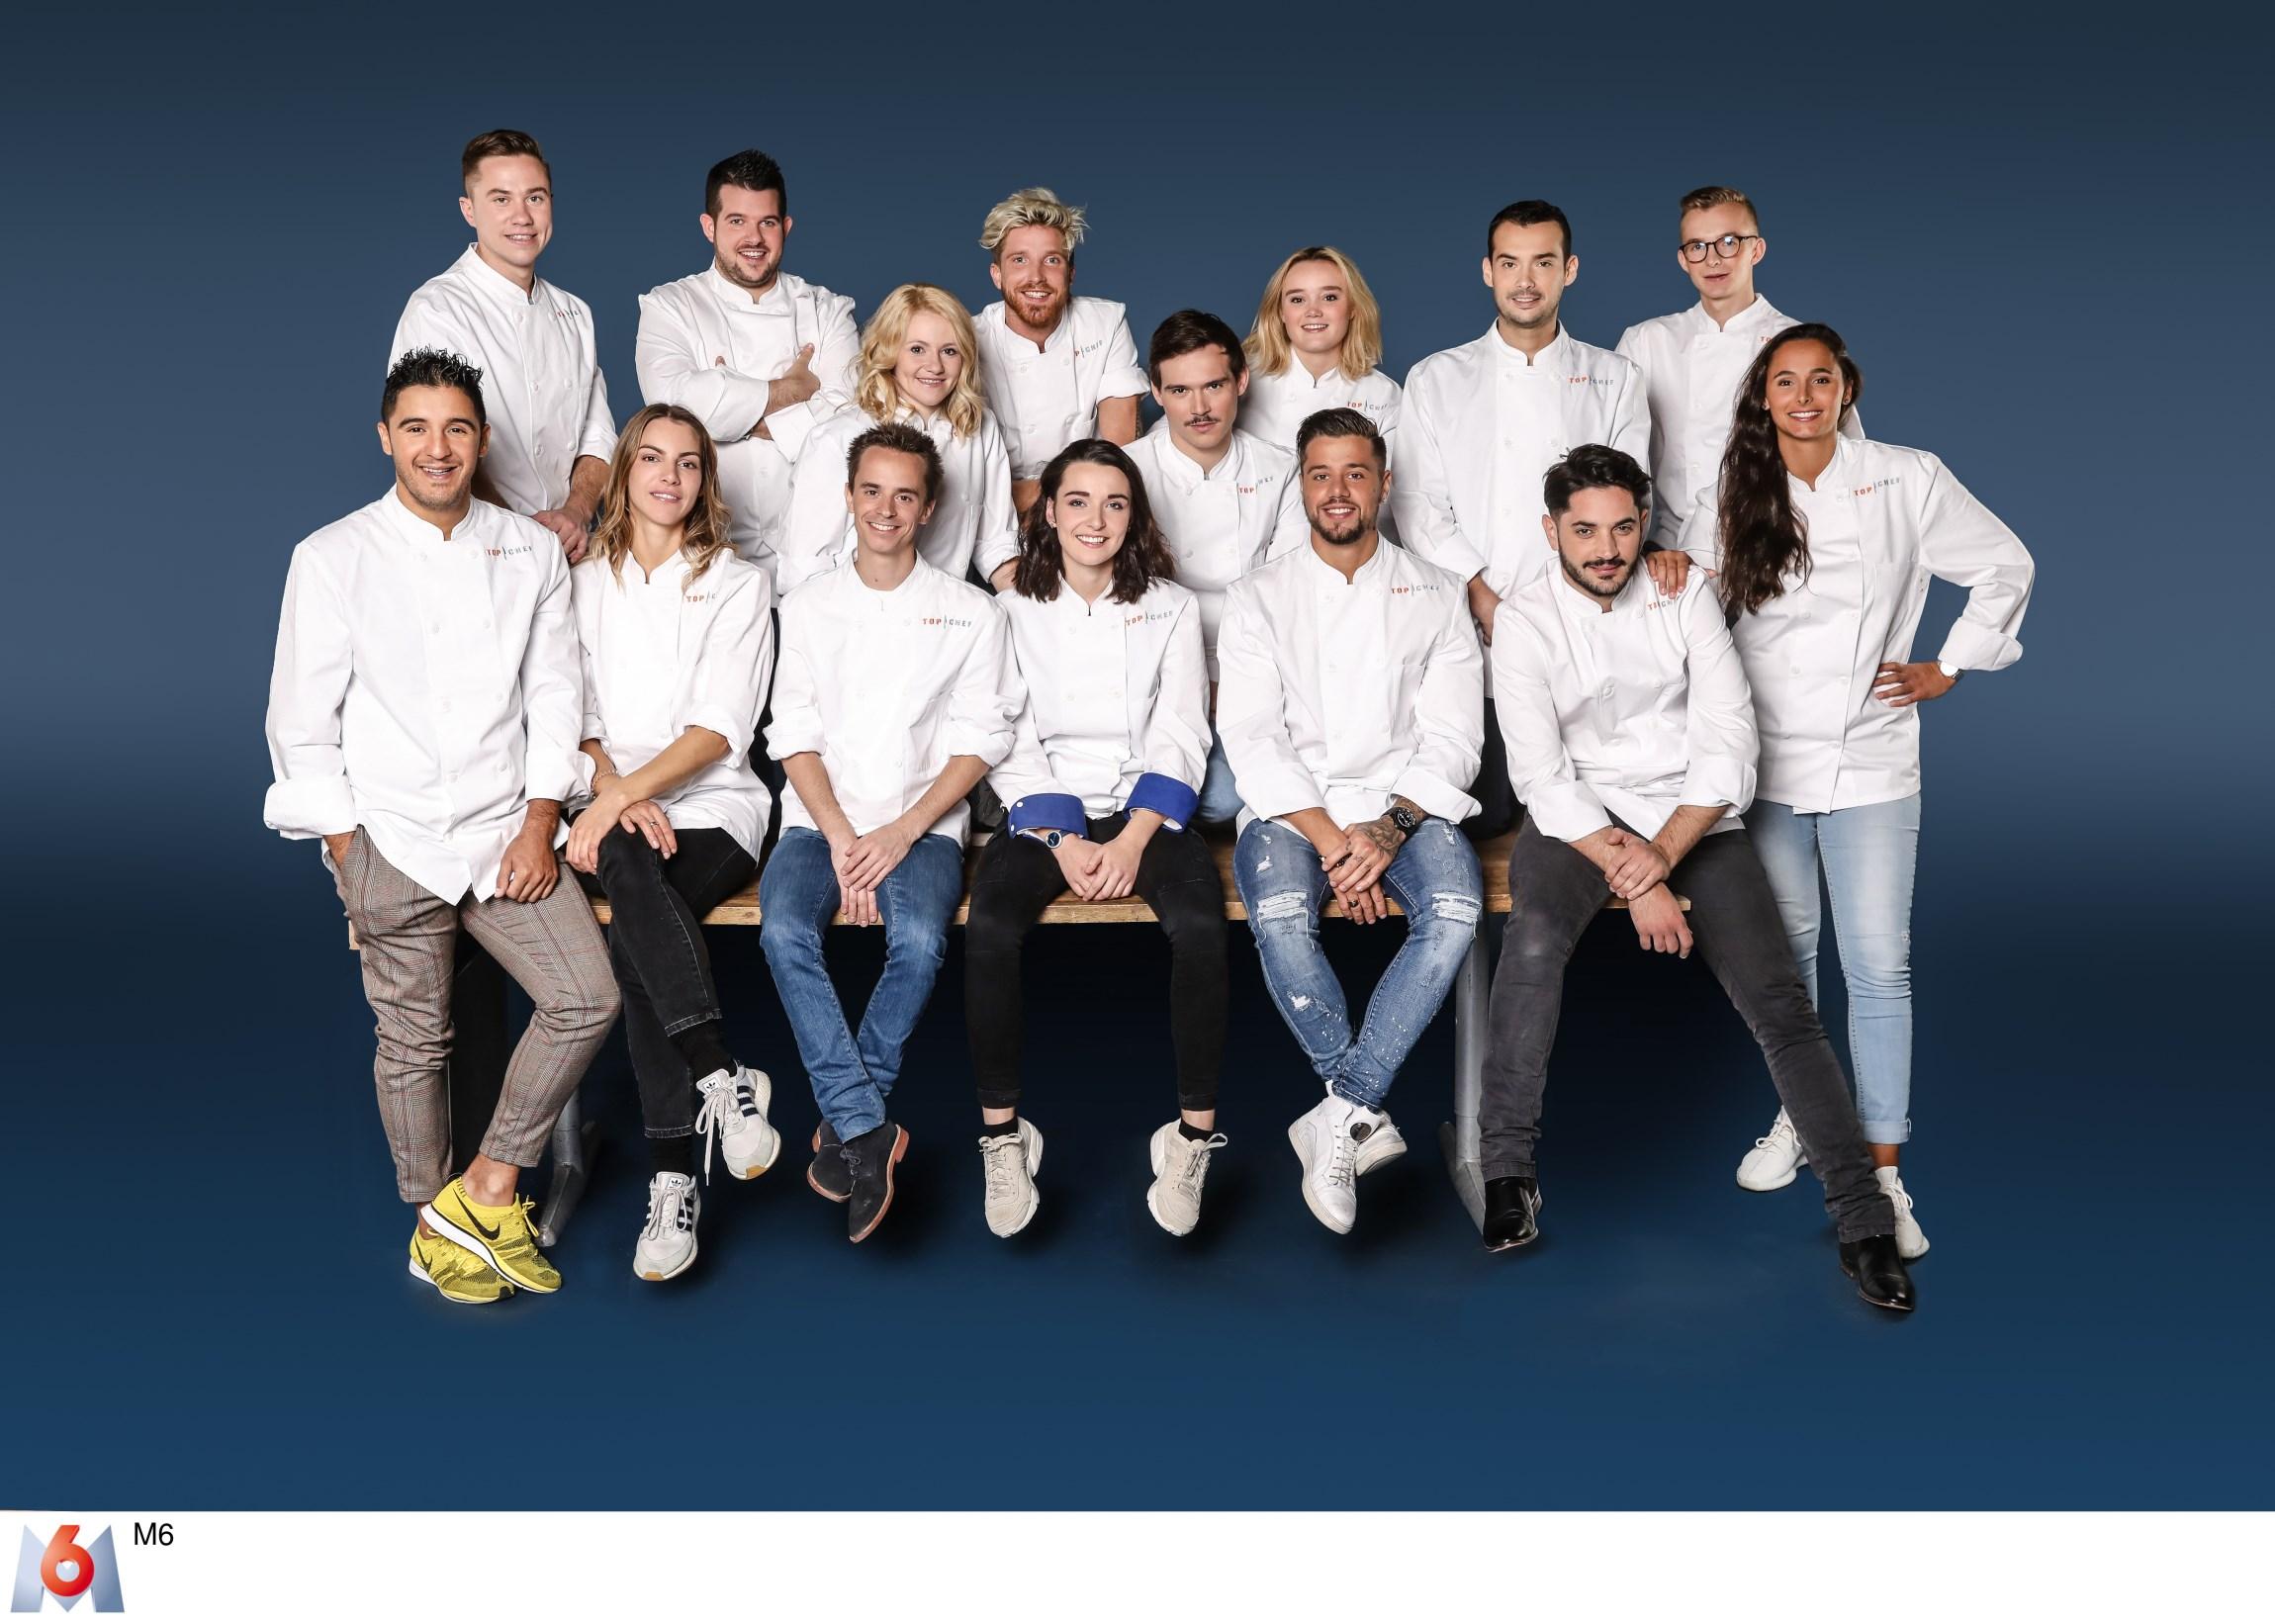 Qui remportera l'édition 2019 de Top Chef ?